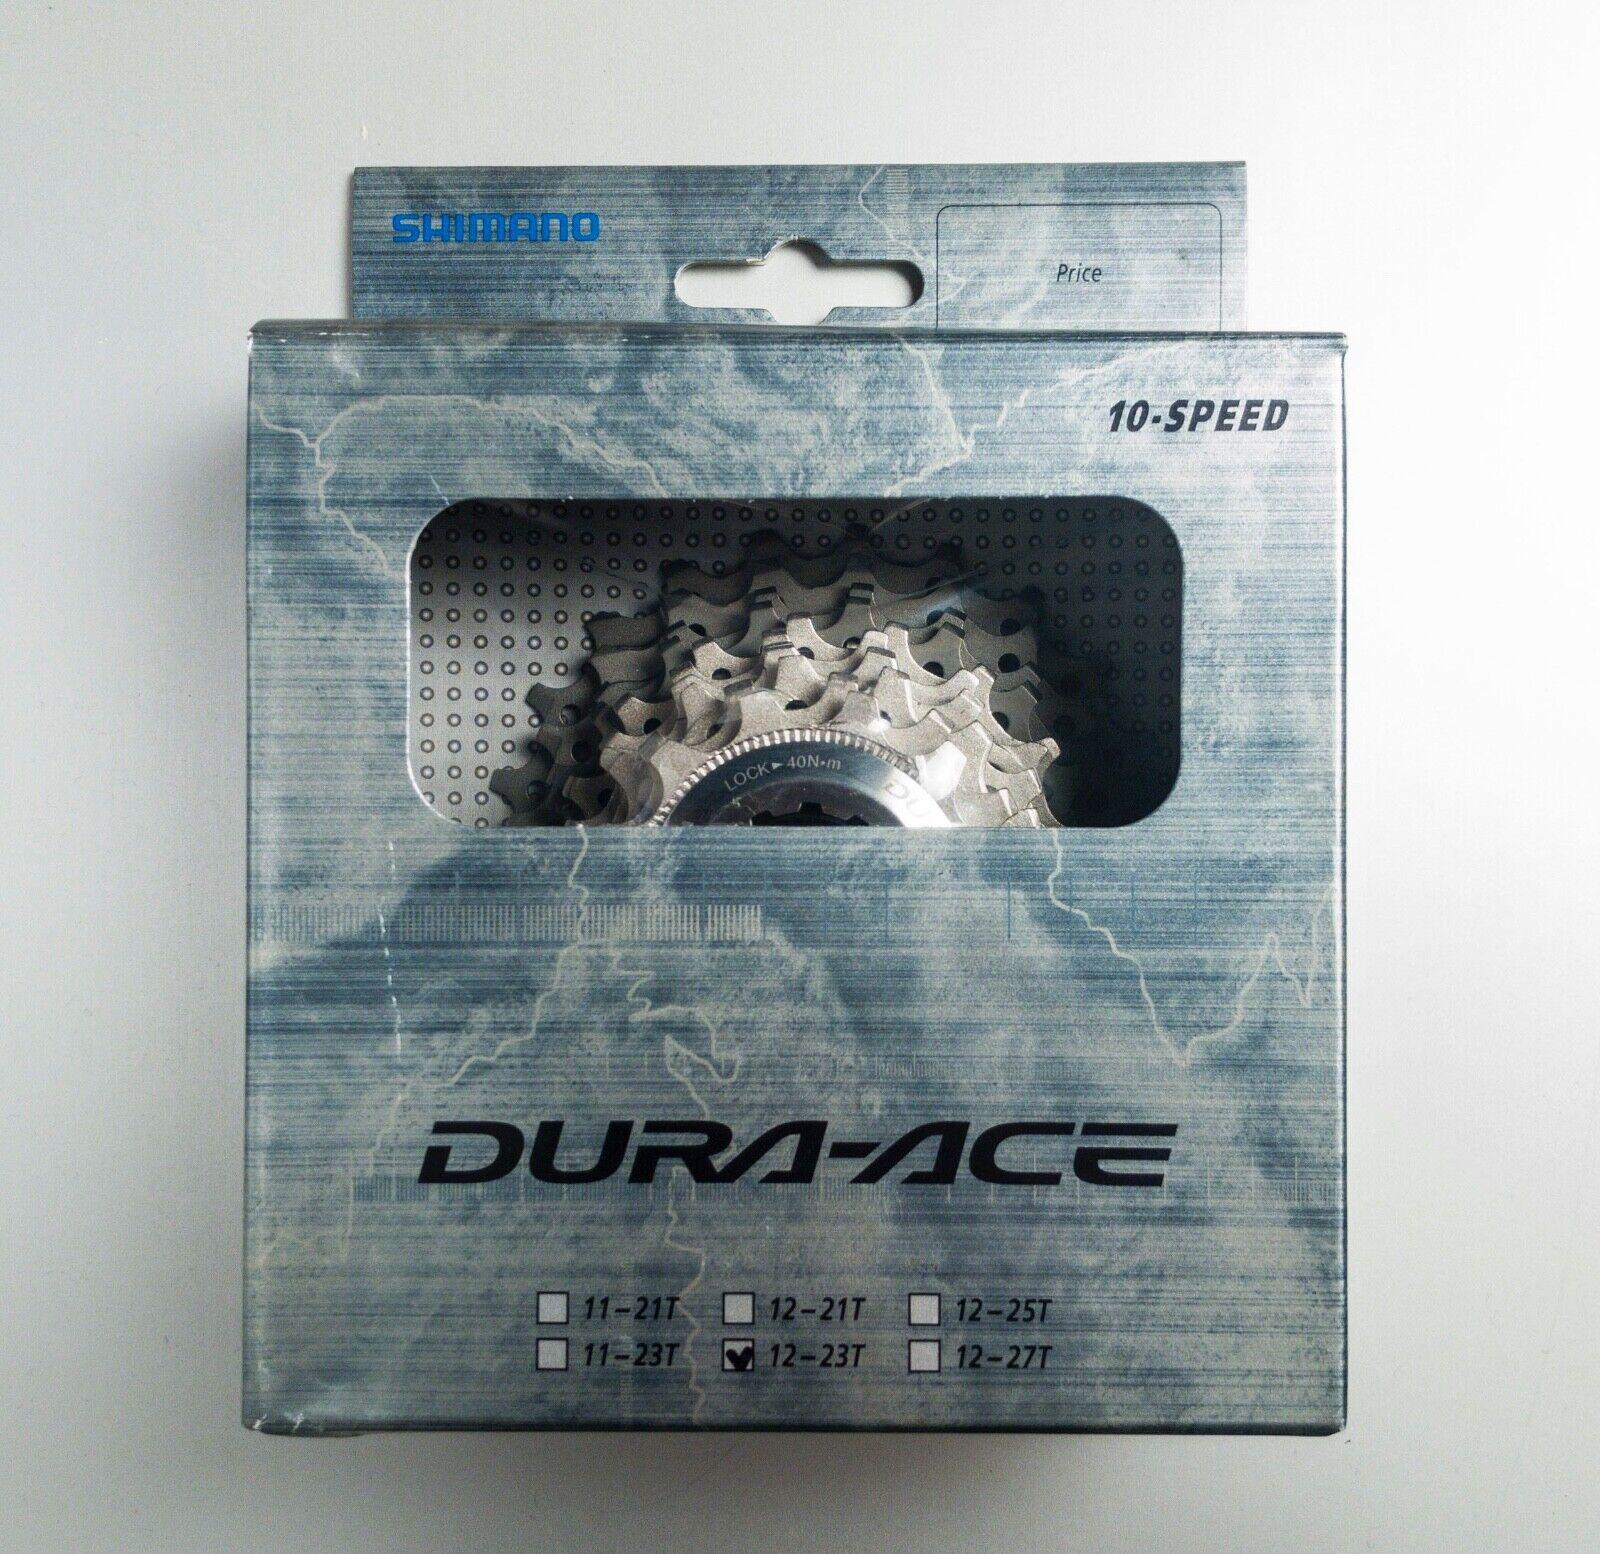 Shimano dura ace CS-7800 12-23T 10 speed cassetta cassette  cogs NOS NEW pignoni